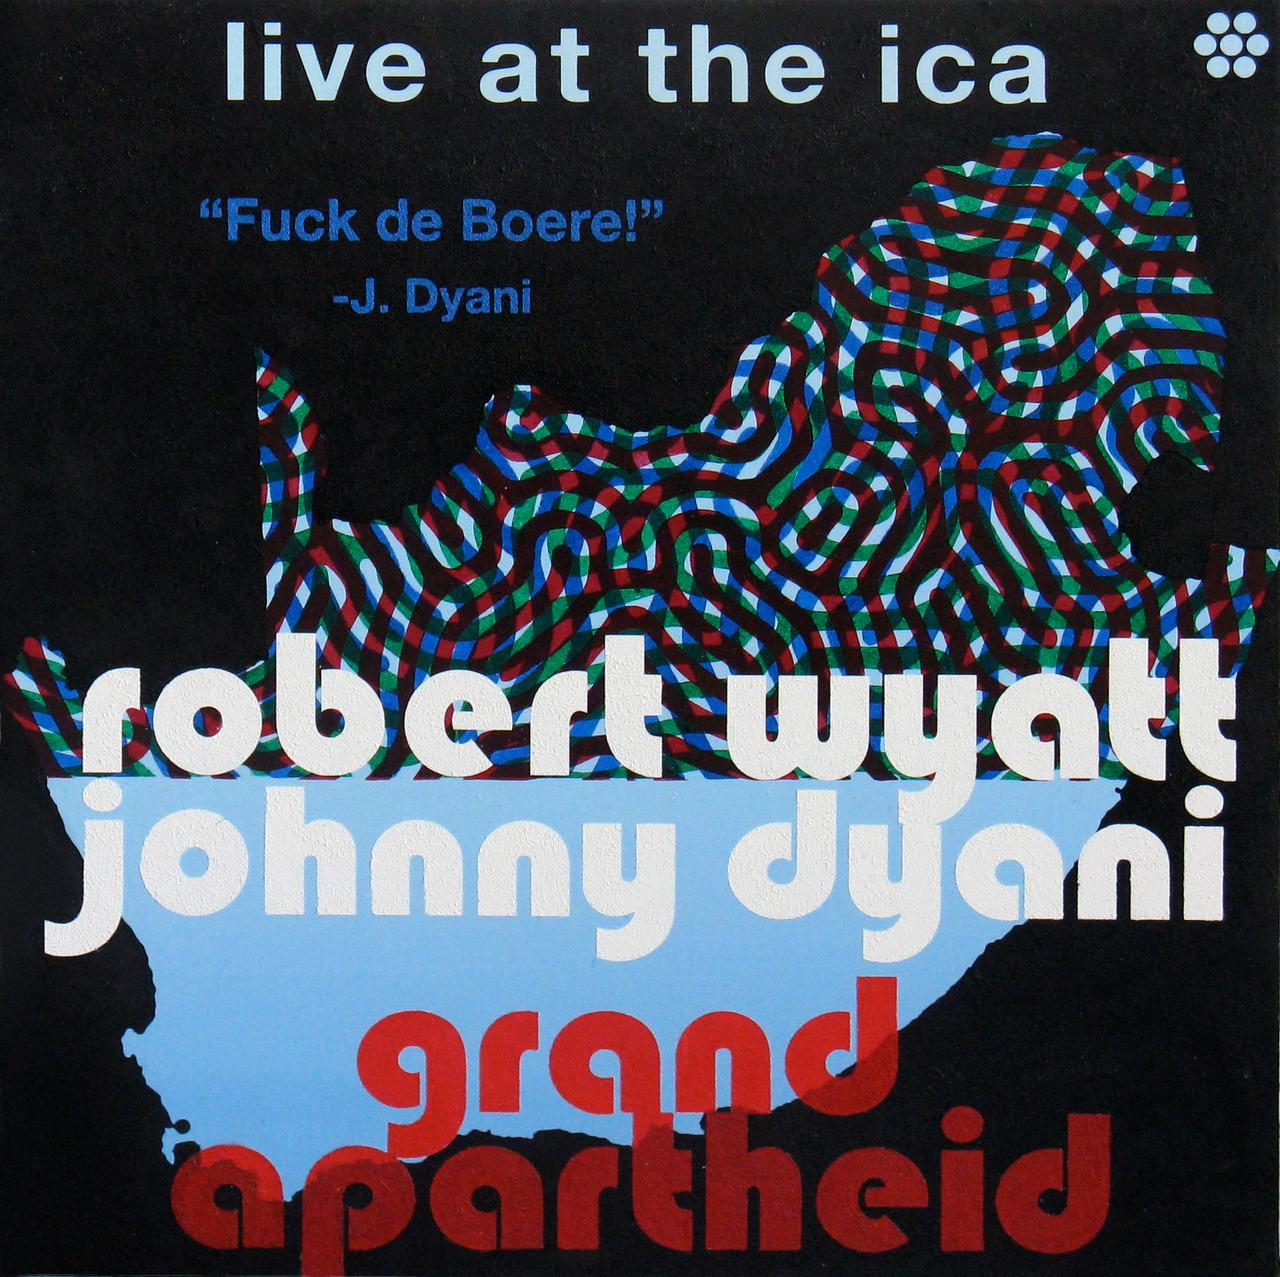 Robert Wyatt and Johnny Dyani-Grand Apartheid-1980